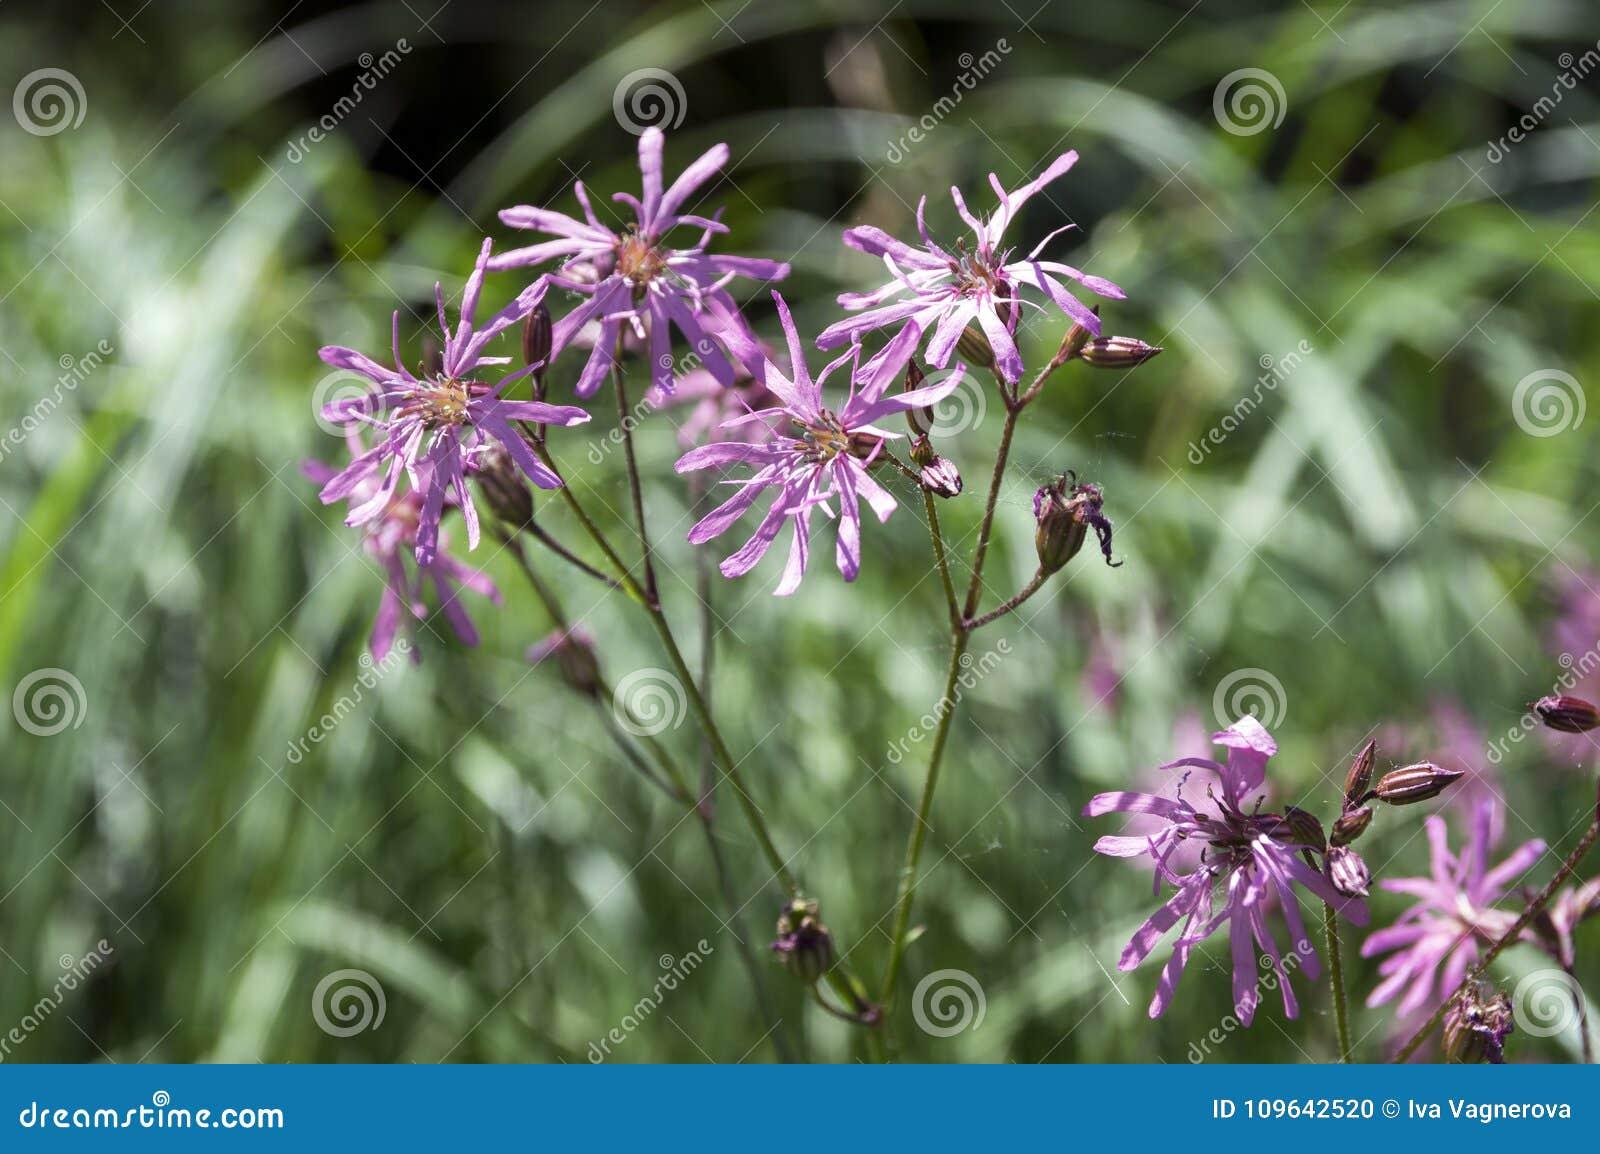 Lychnis Flos Cuculi Blooming Flower On Meadow Stock Photo Image Of